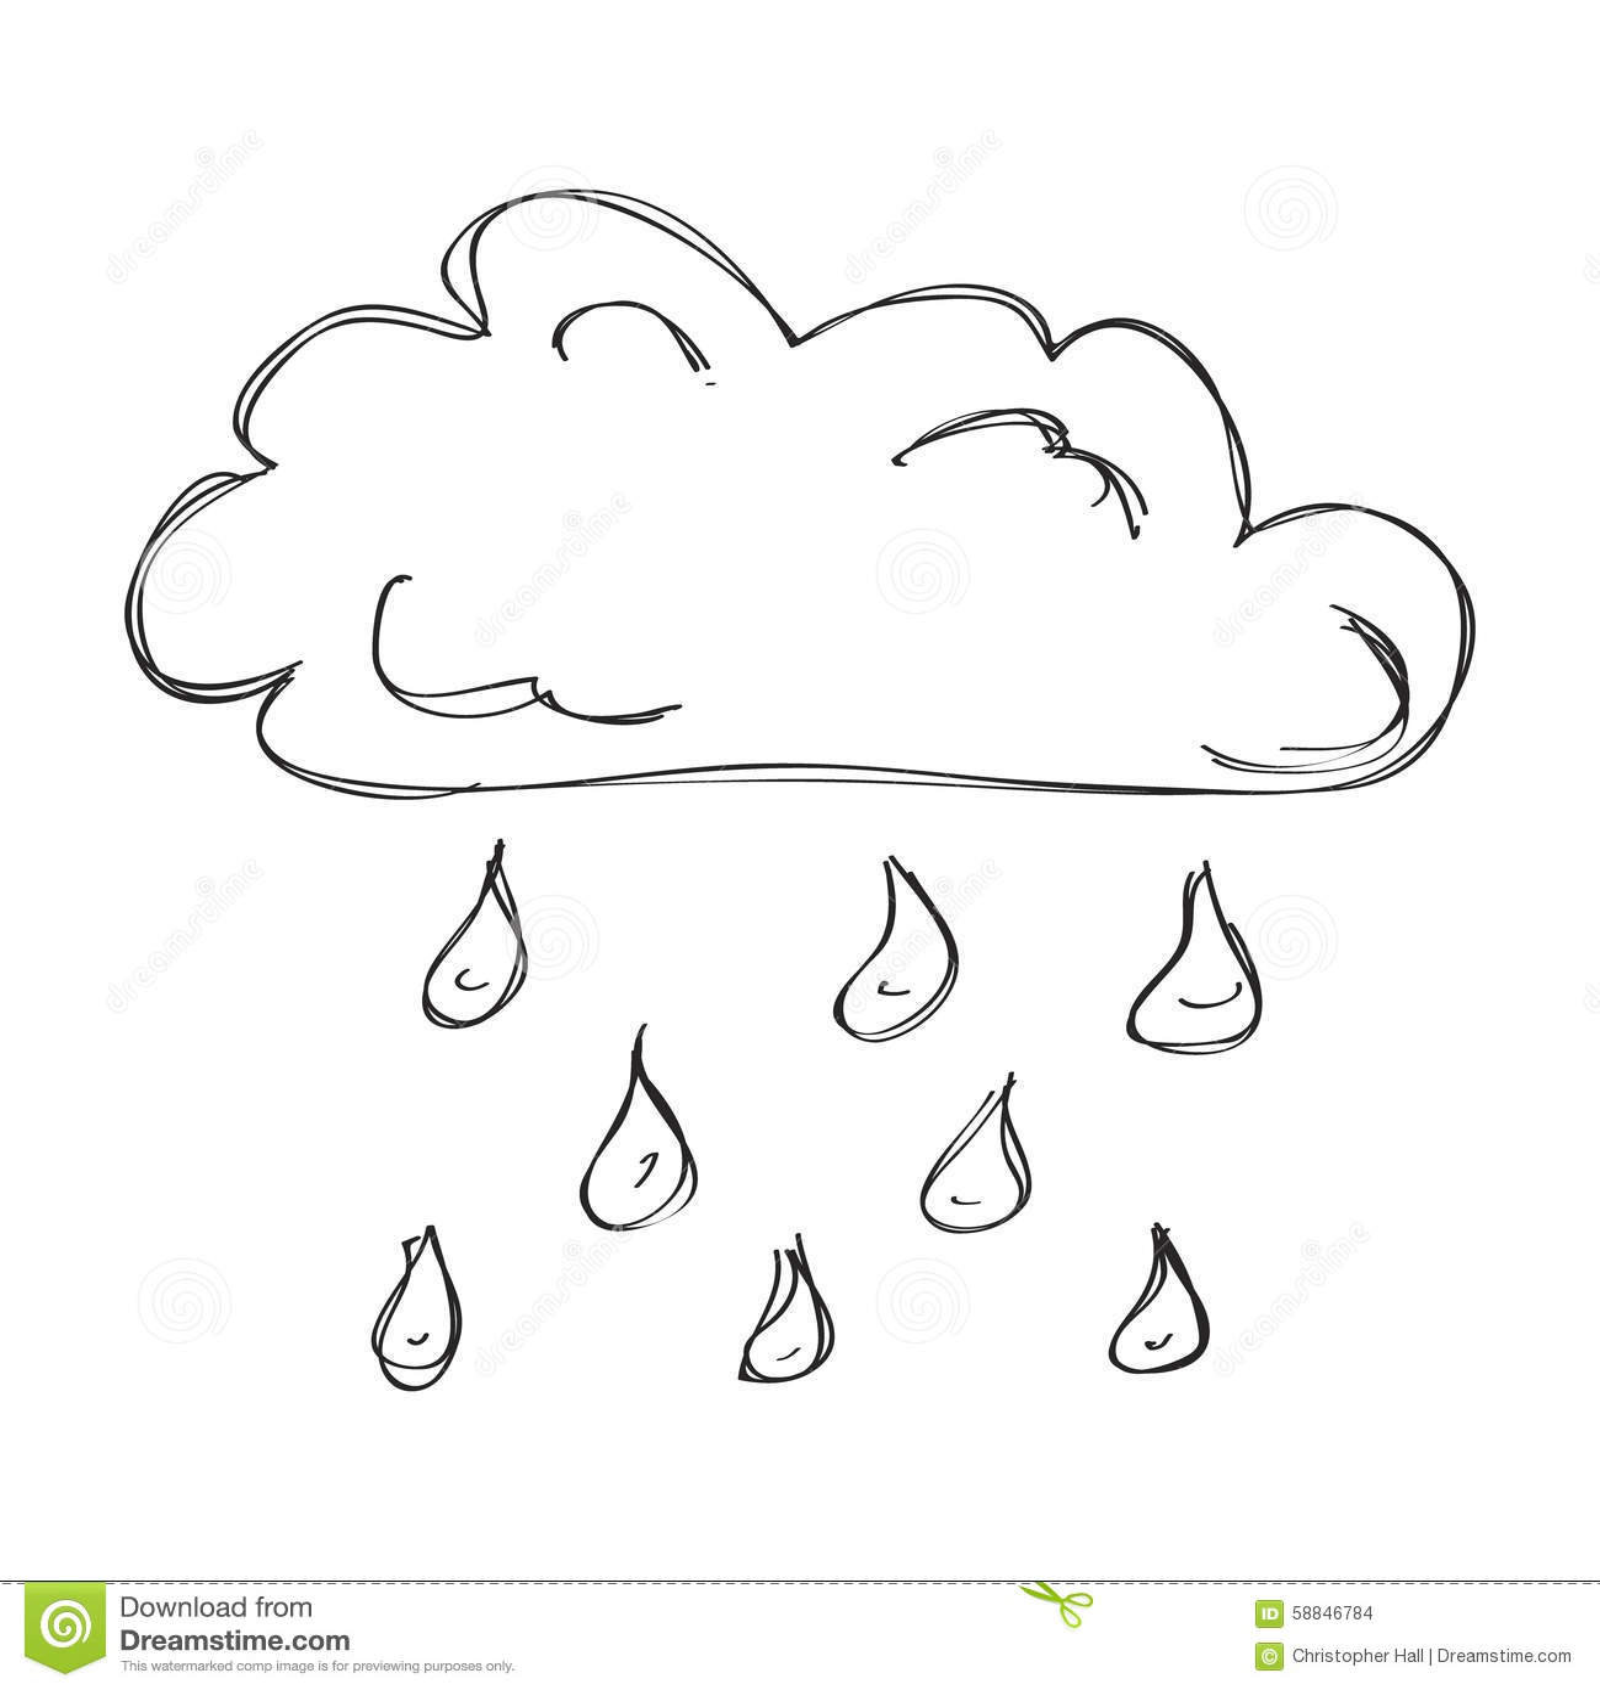 Enkelt Klotter Av Ett Moln Med Regn Vektor Illustrationer